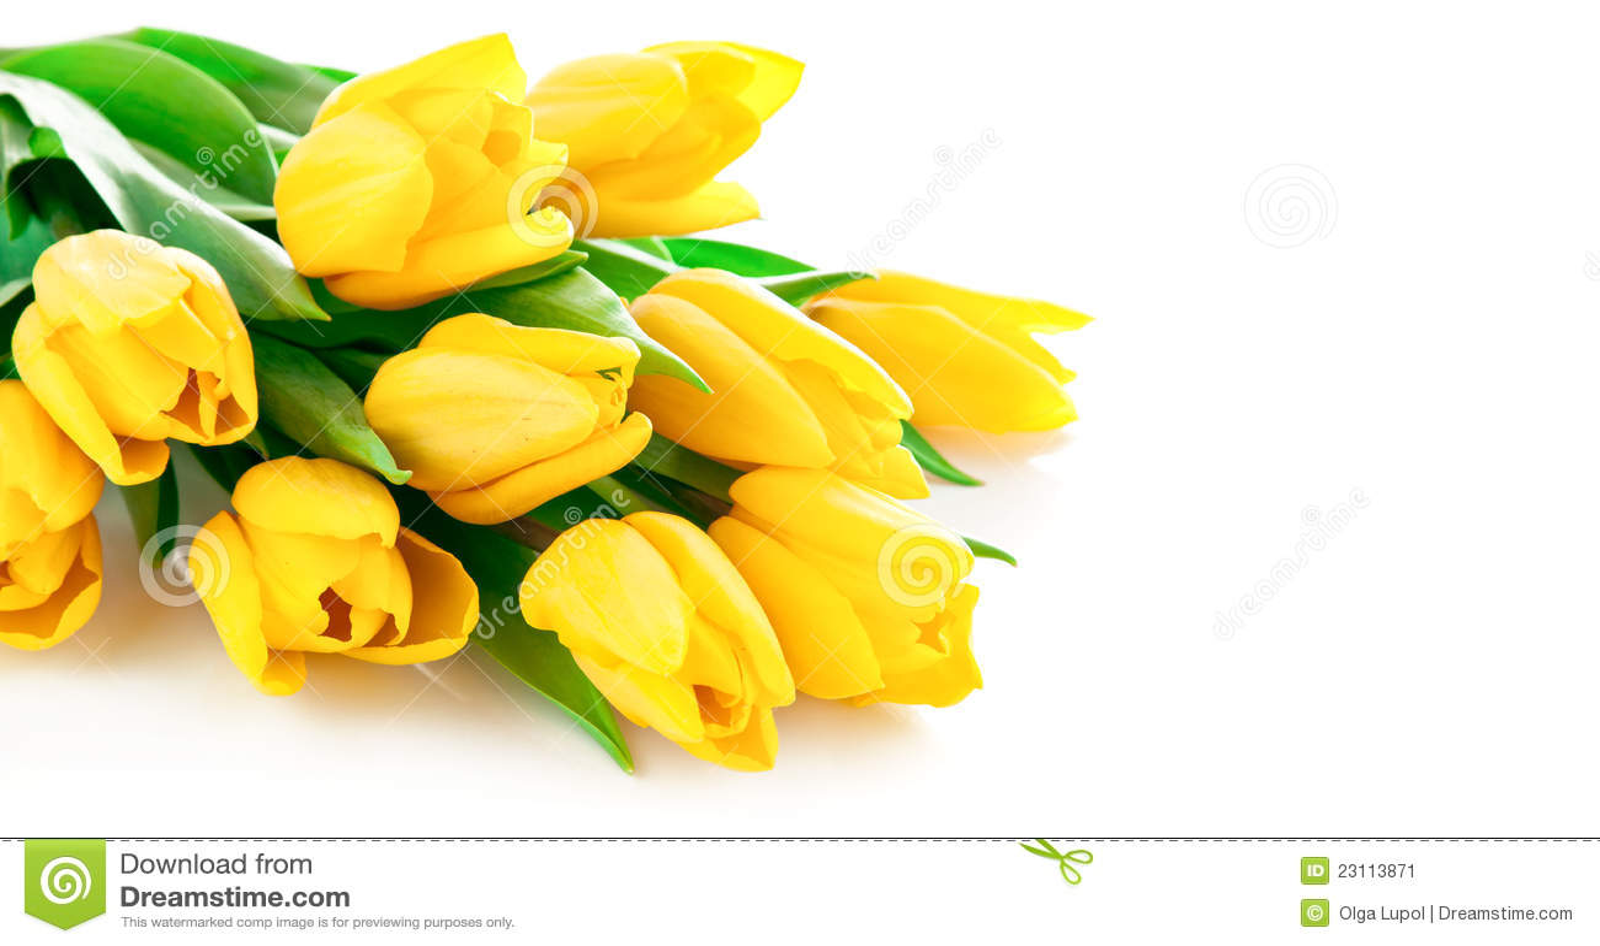 Yellow Tulip Flowers Bouquet Stock Image - Image: 23113871